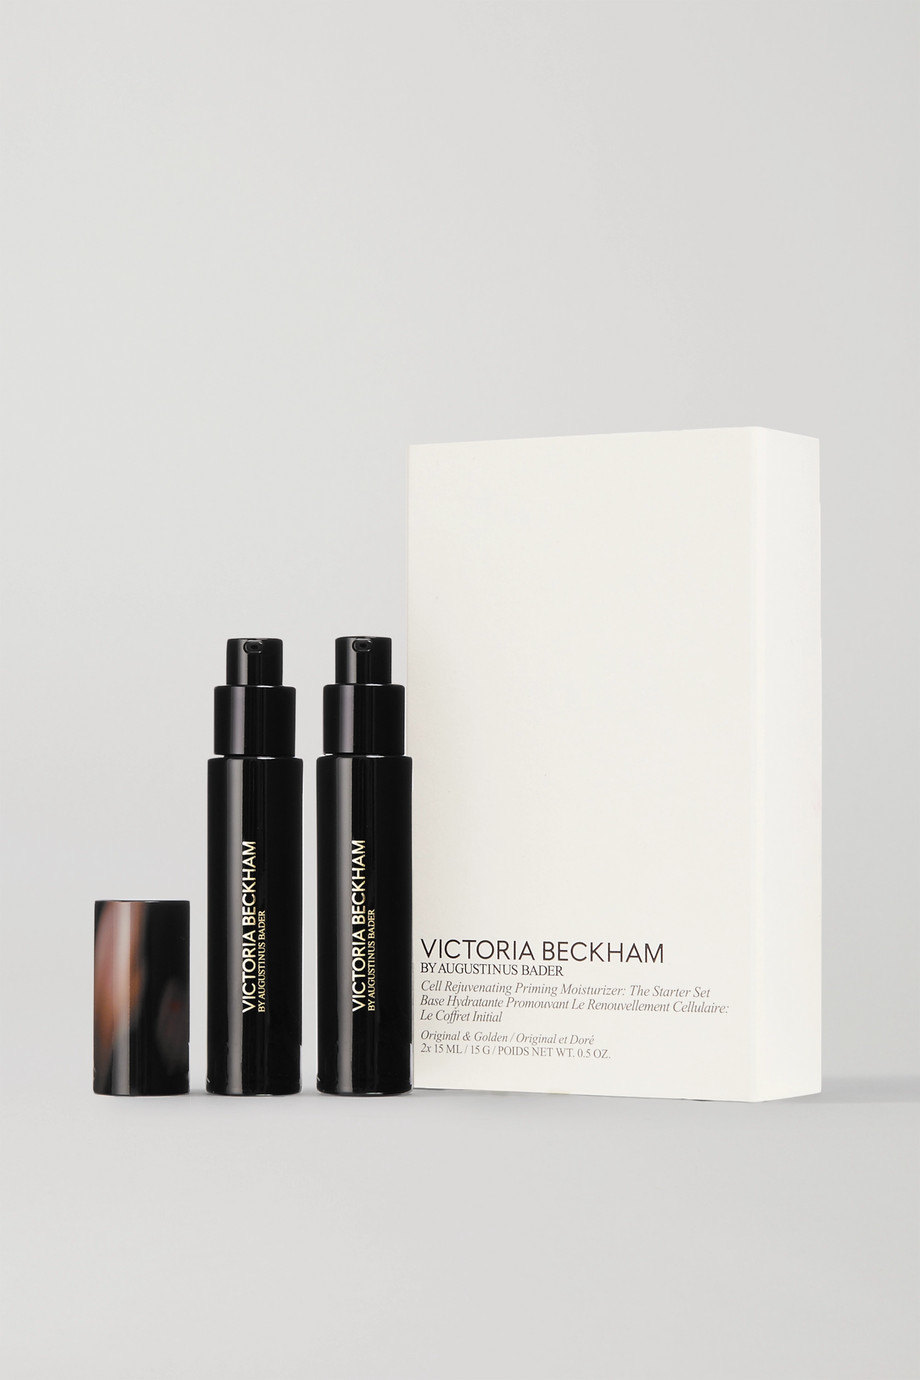 Victoria Beckham Beauty Victoria Beckham by Augustinus Bader Cell Rejuvenating Priming Moisturizer Starter Set – Hautpflegeset